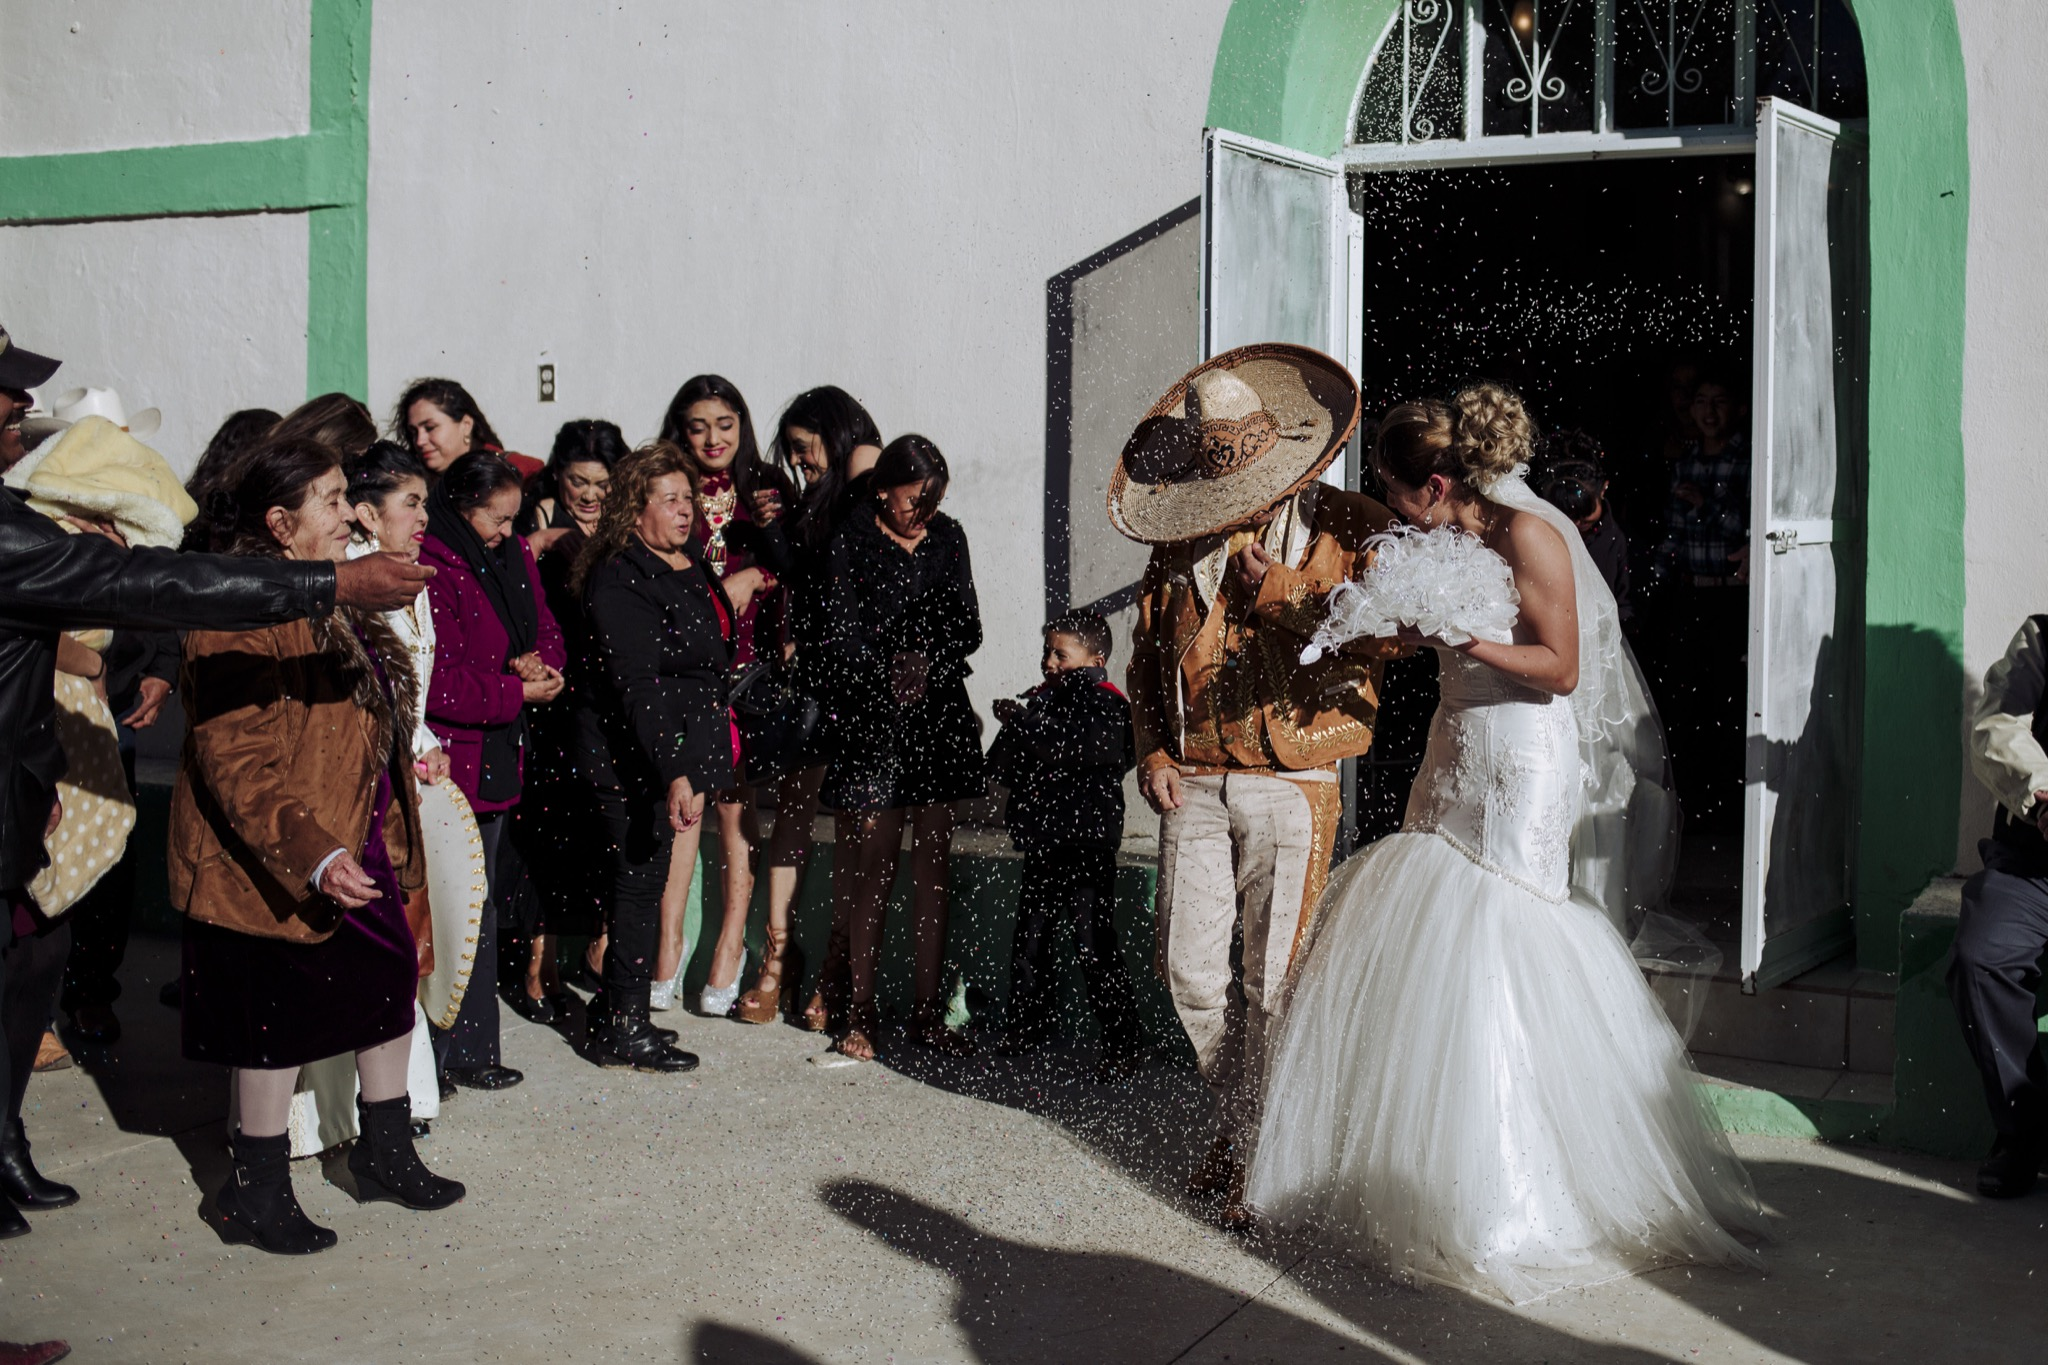 javier_noriega_fotografo_profesional_bodas_zacatecas_mexico_chihuahua_photographer_17